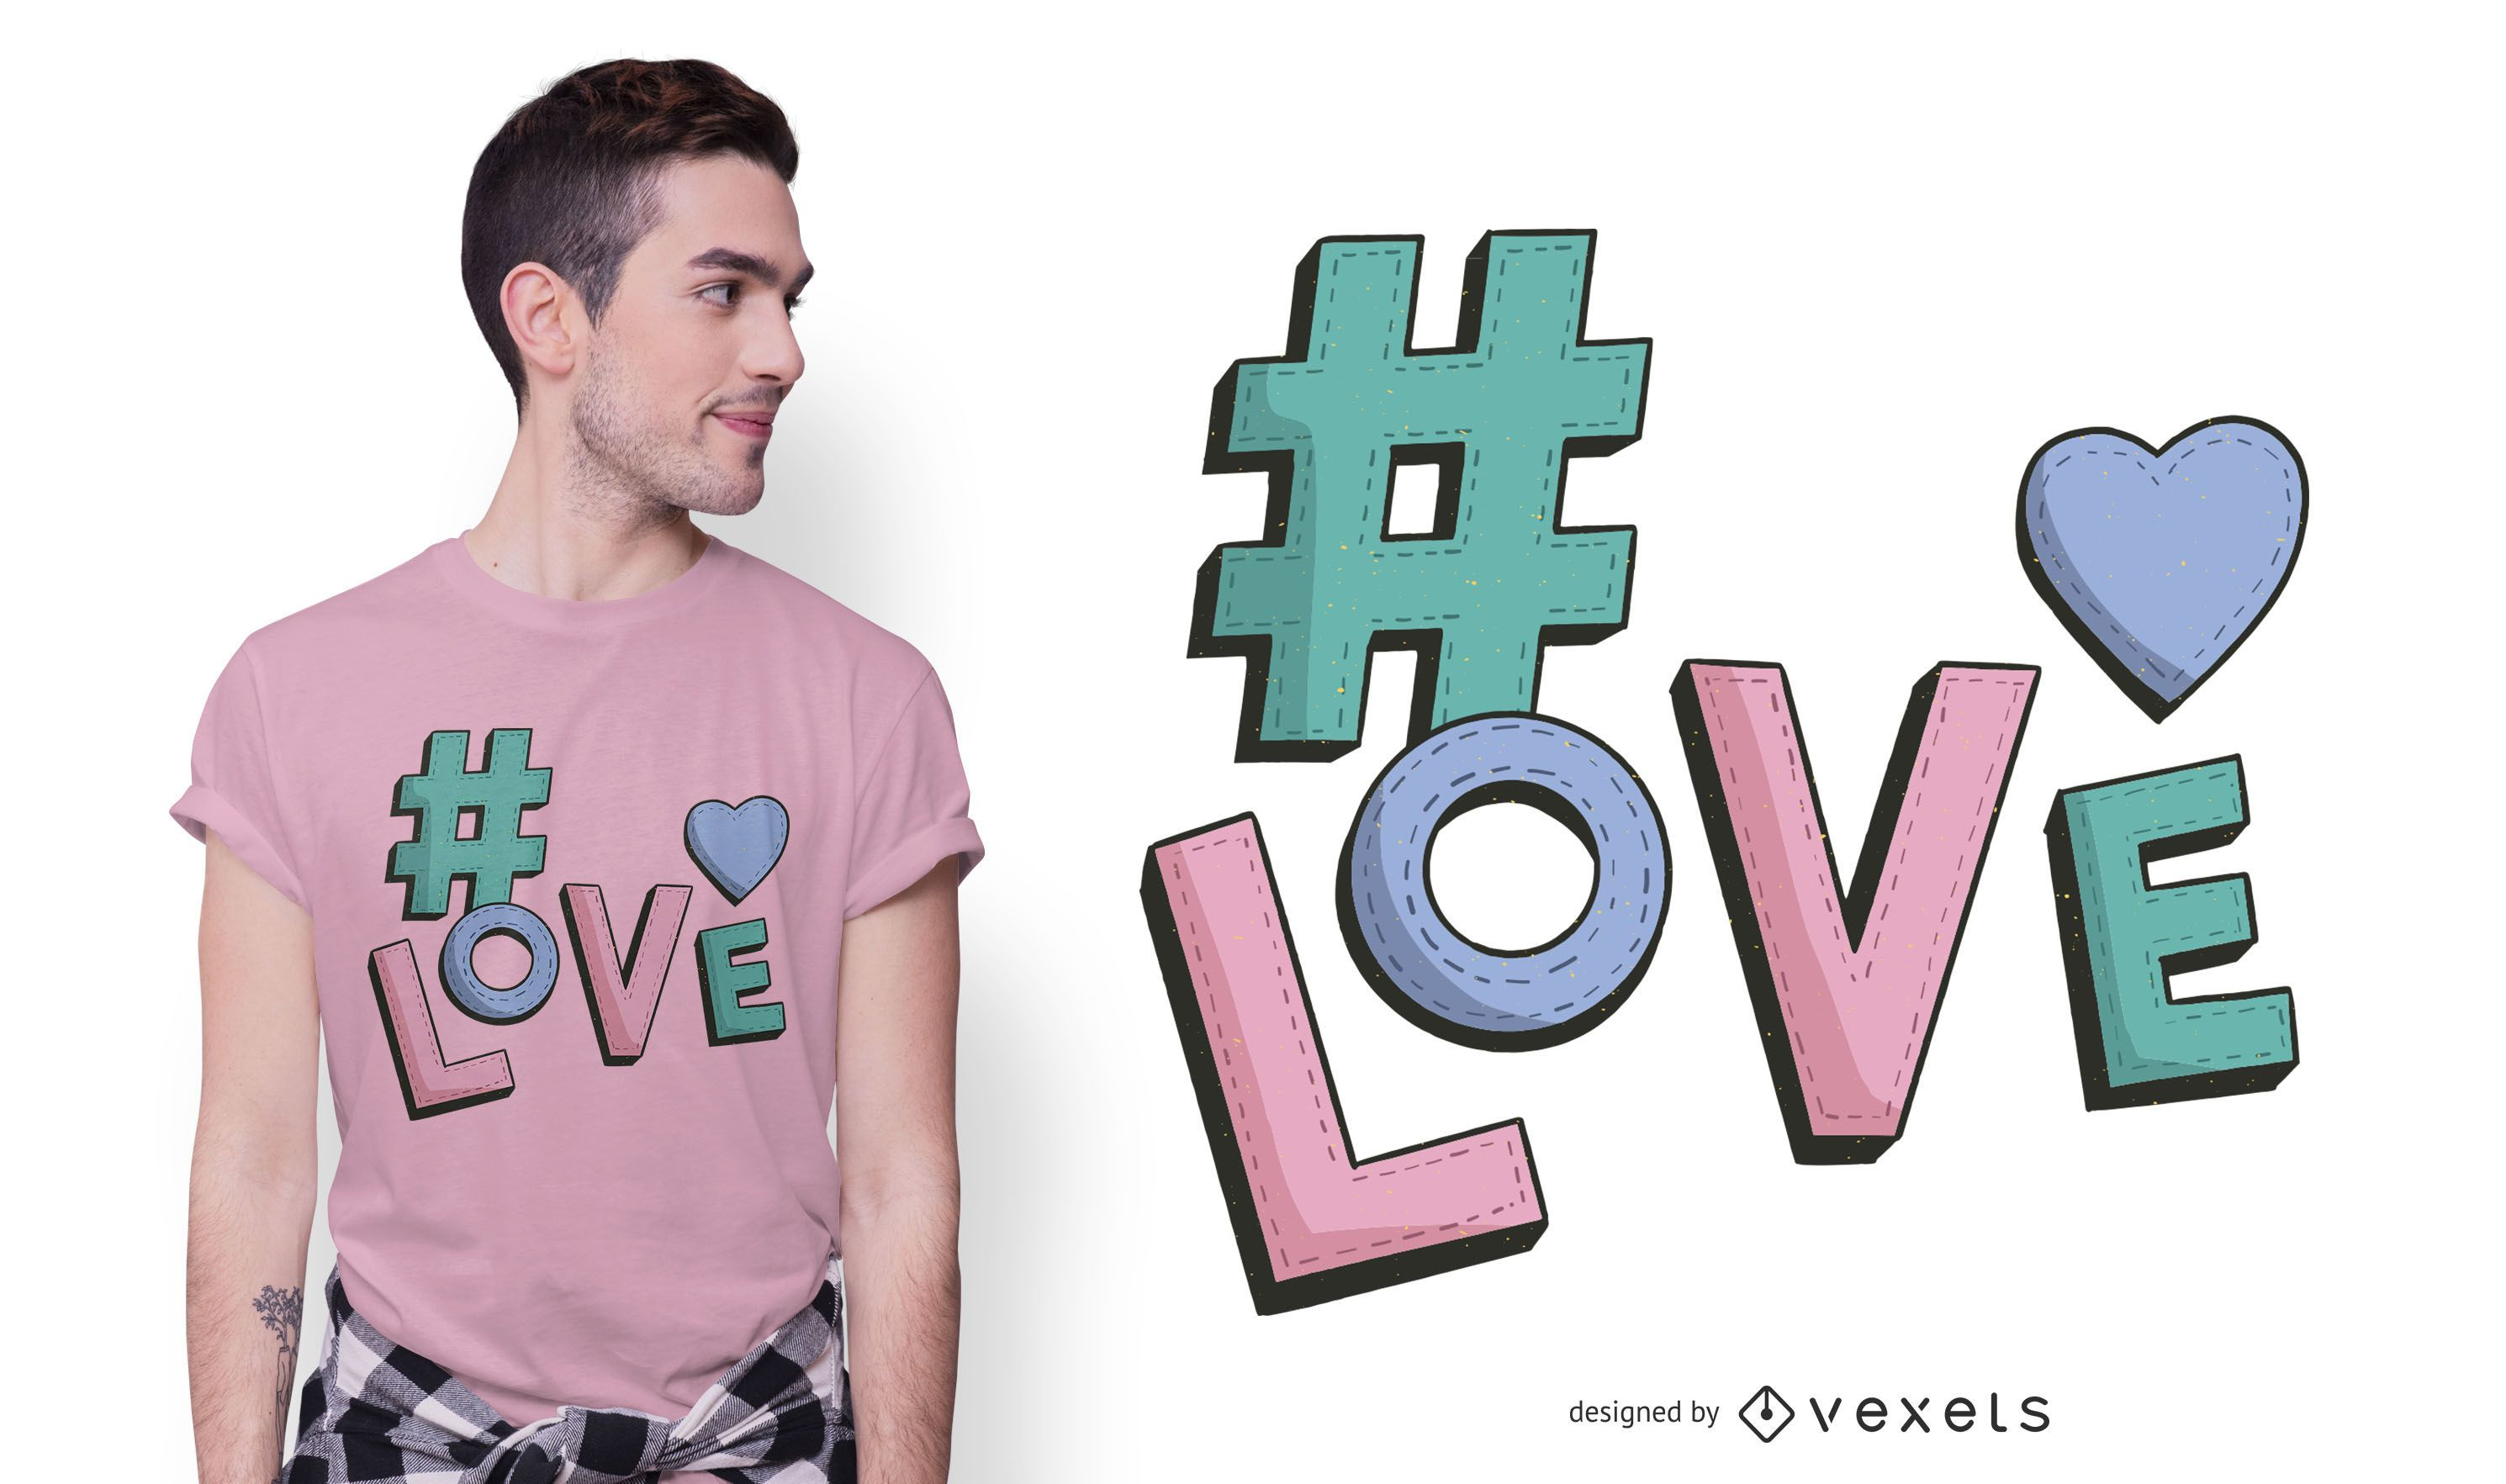 Hashtag love t-shirt design